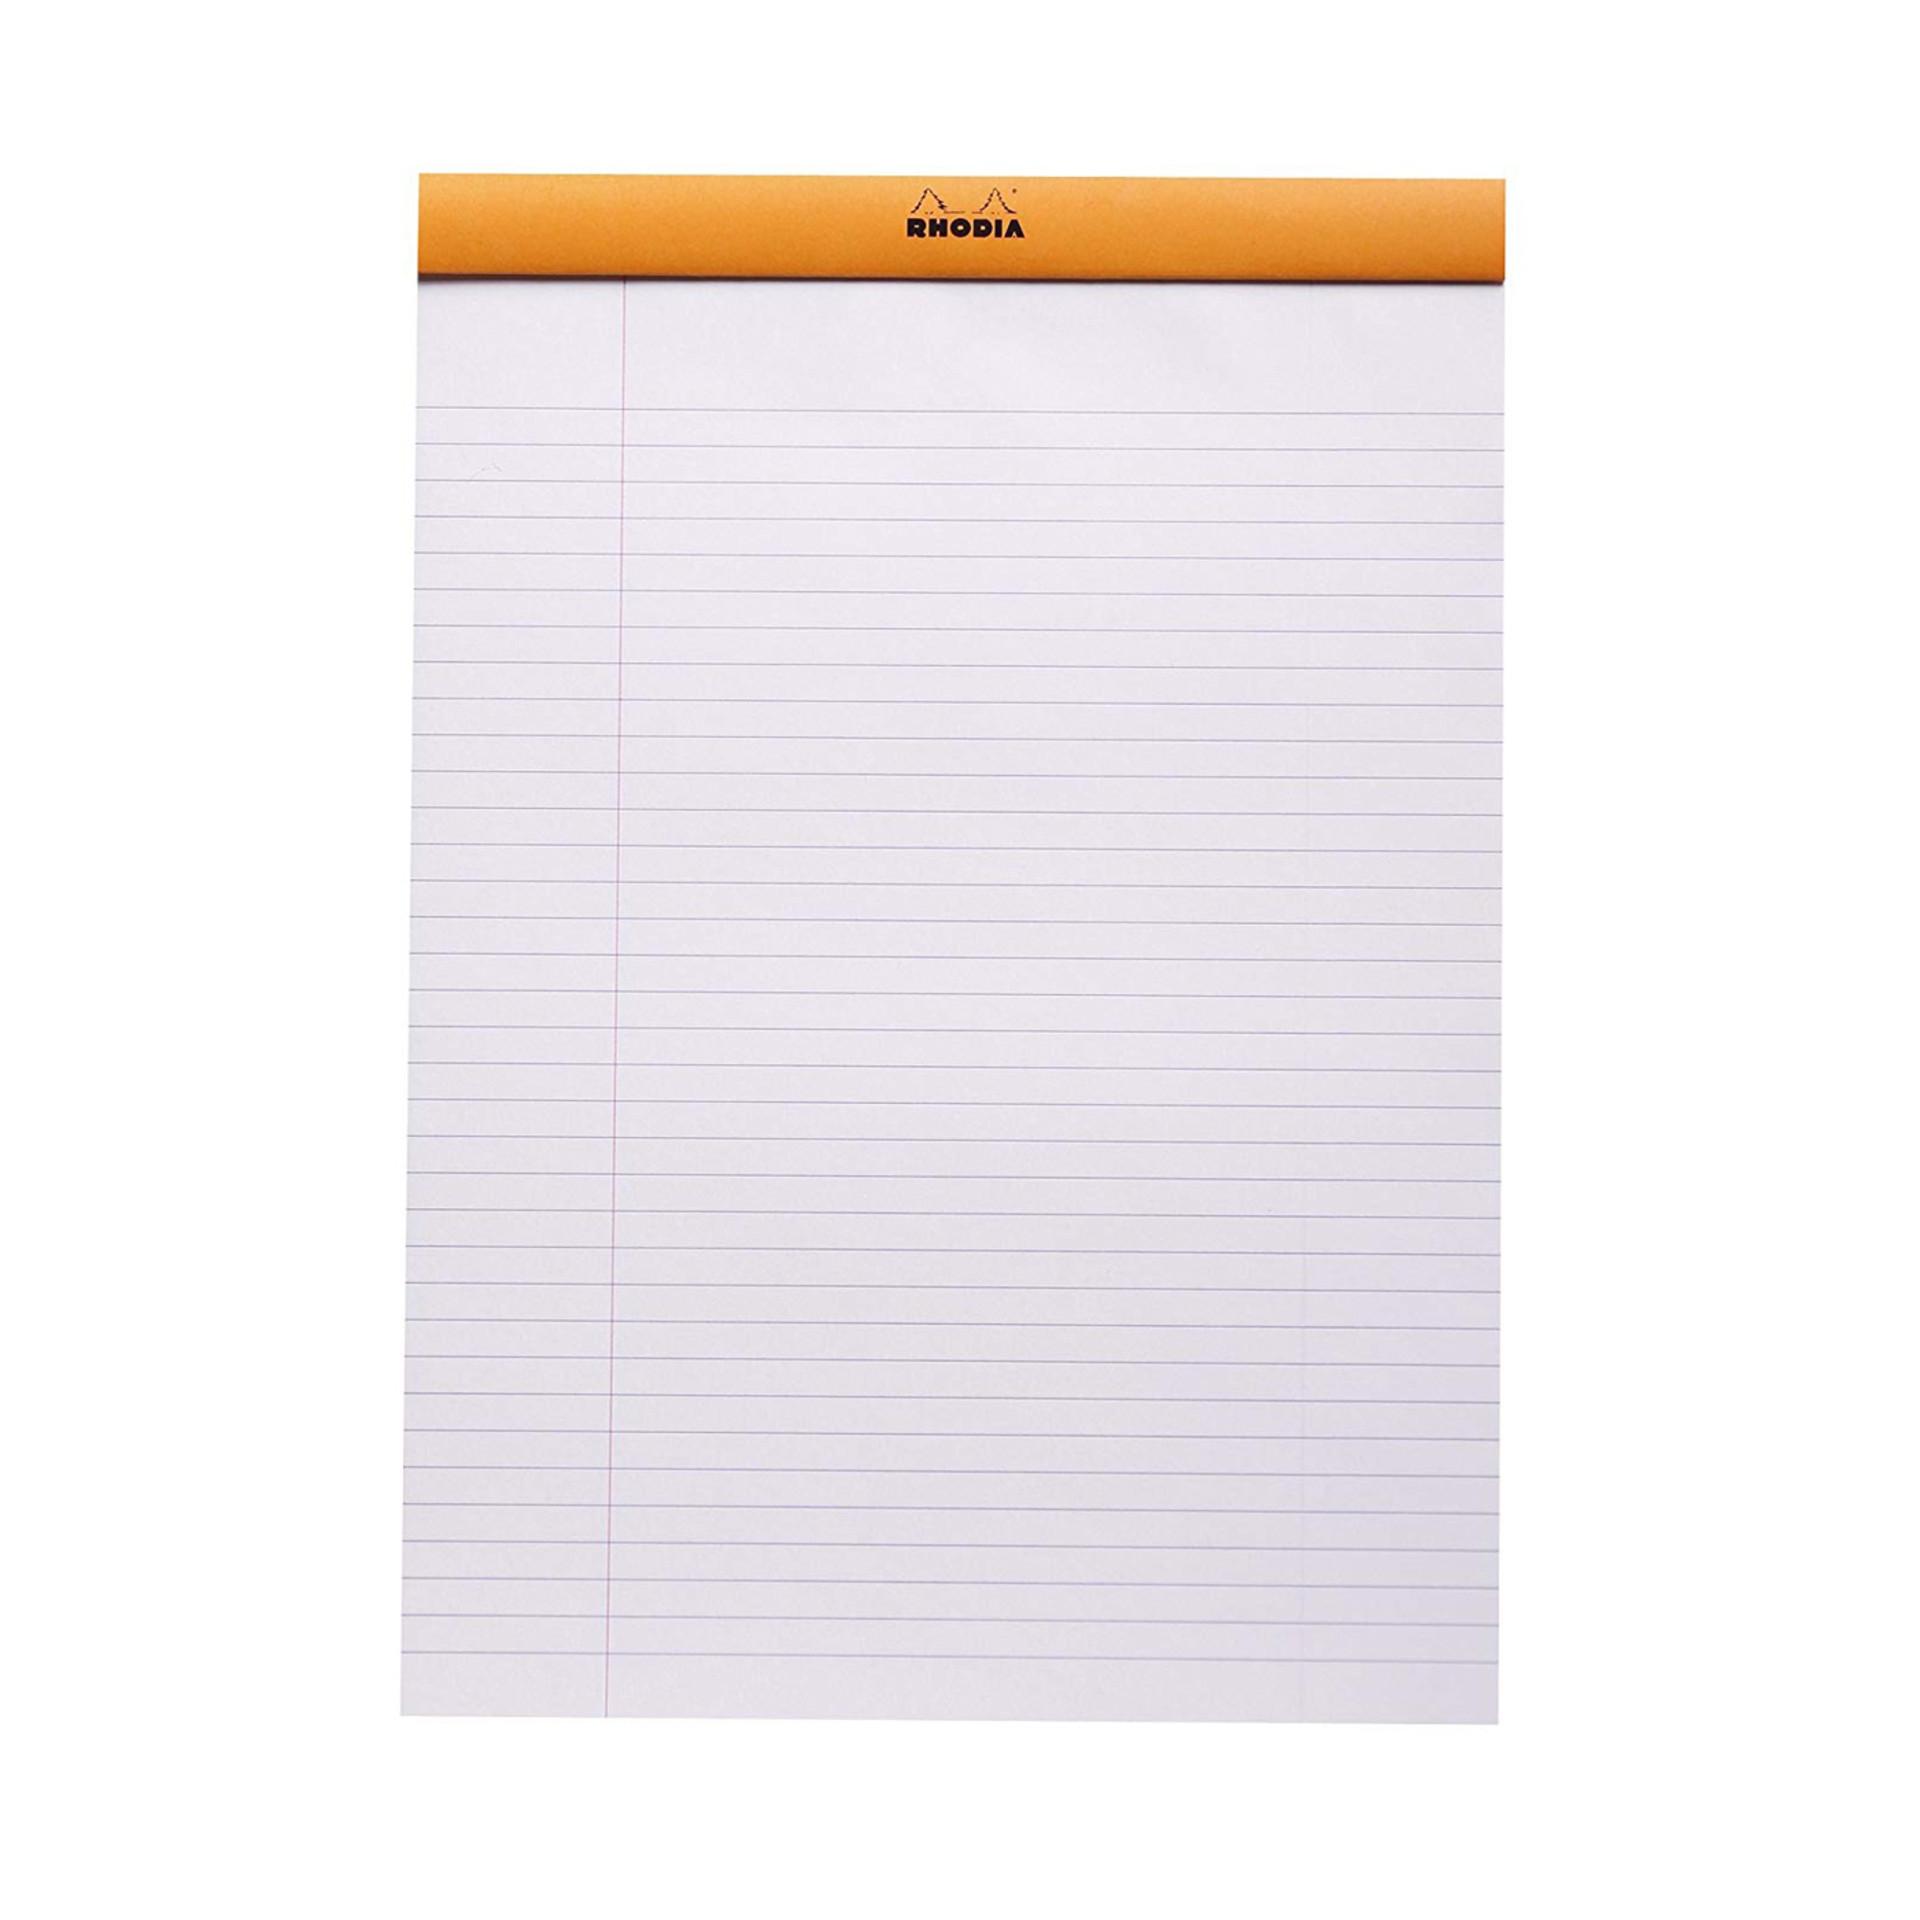 "Rhodia Notepad 81/4""x113/4"" Paper"